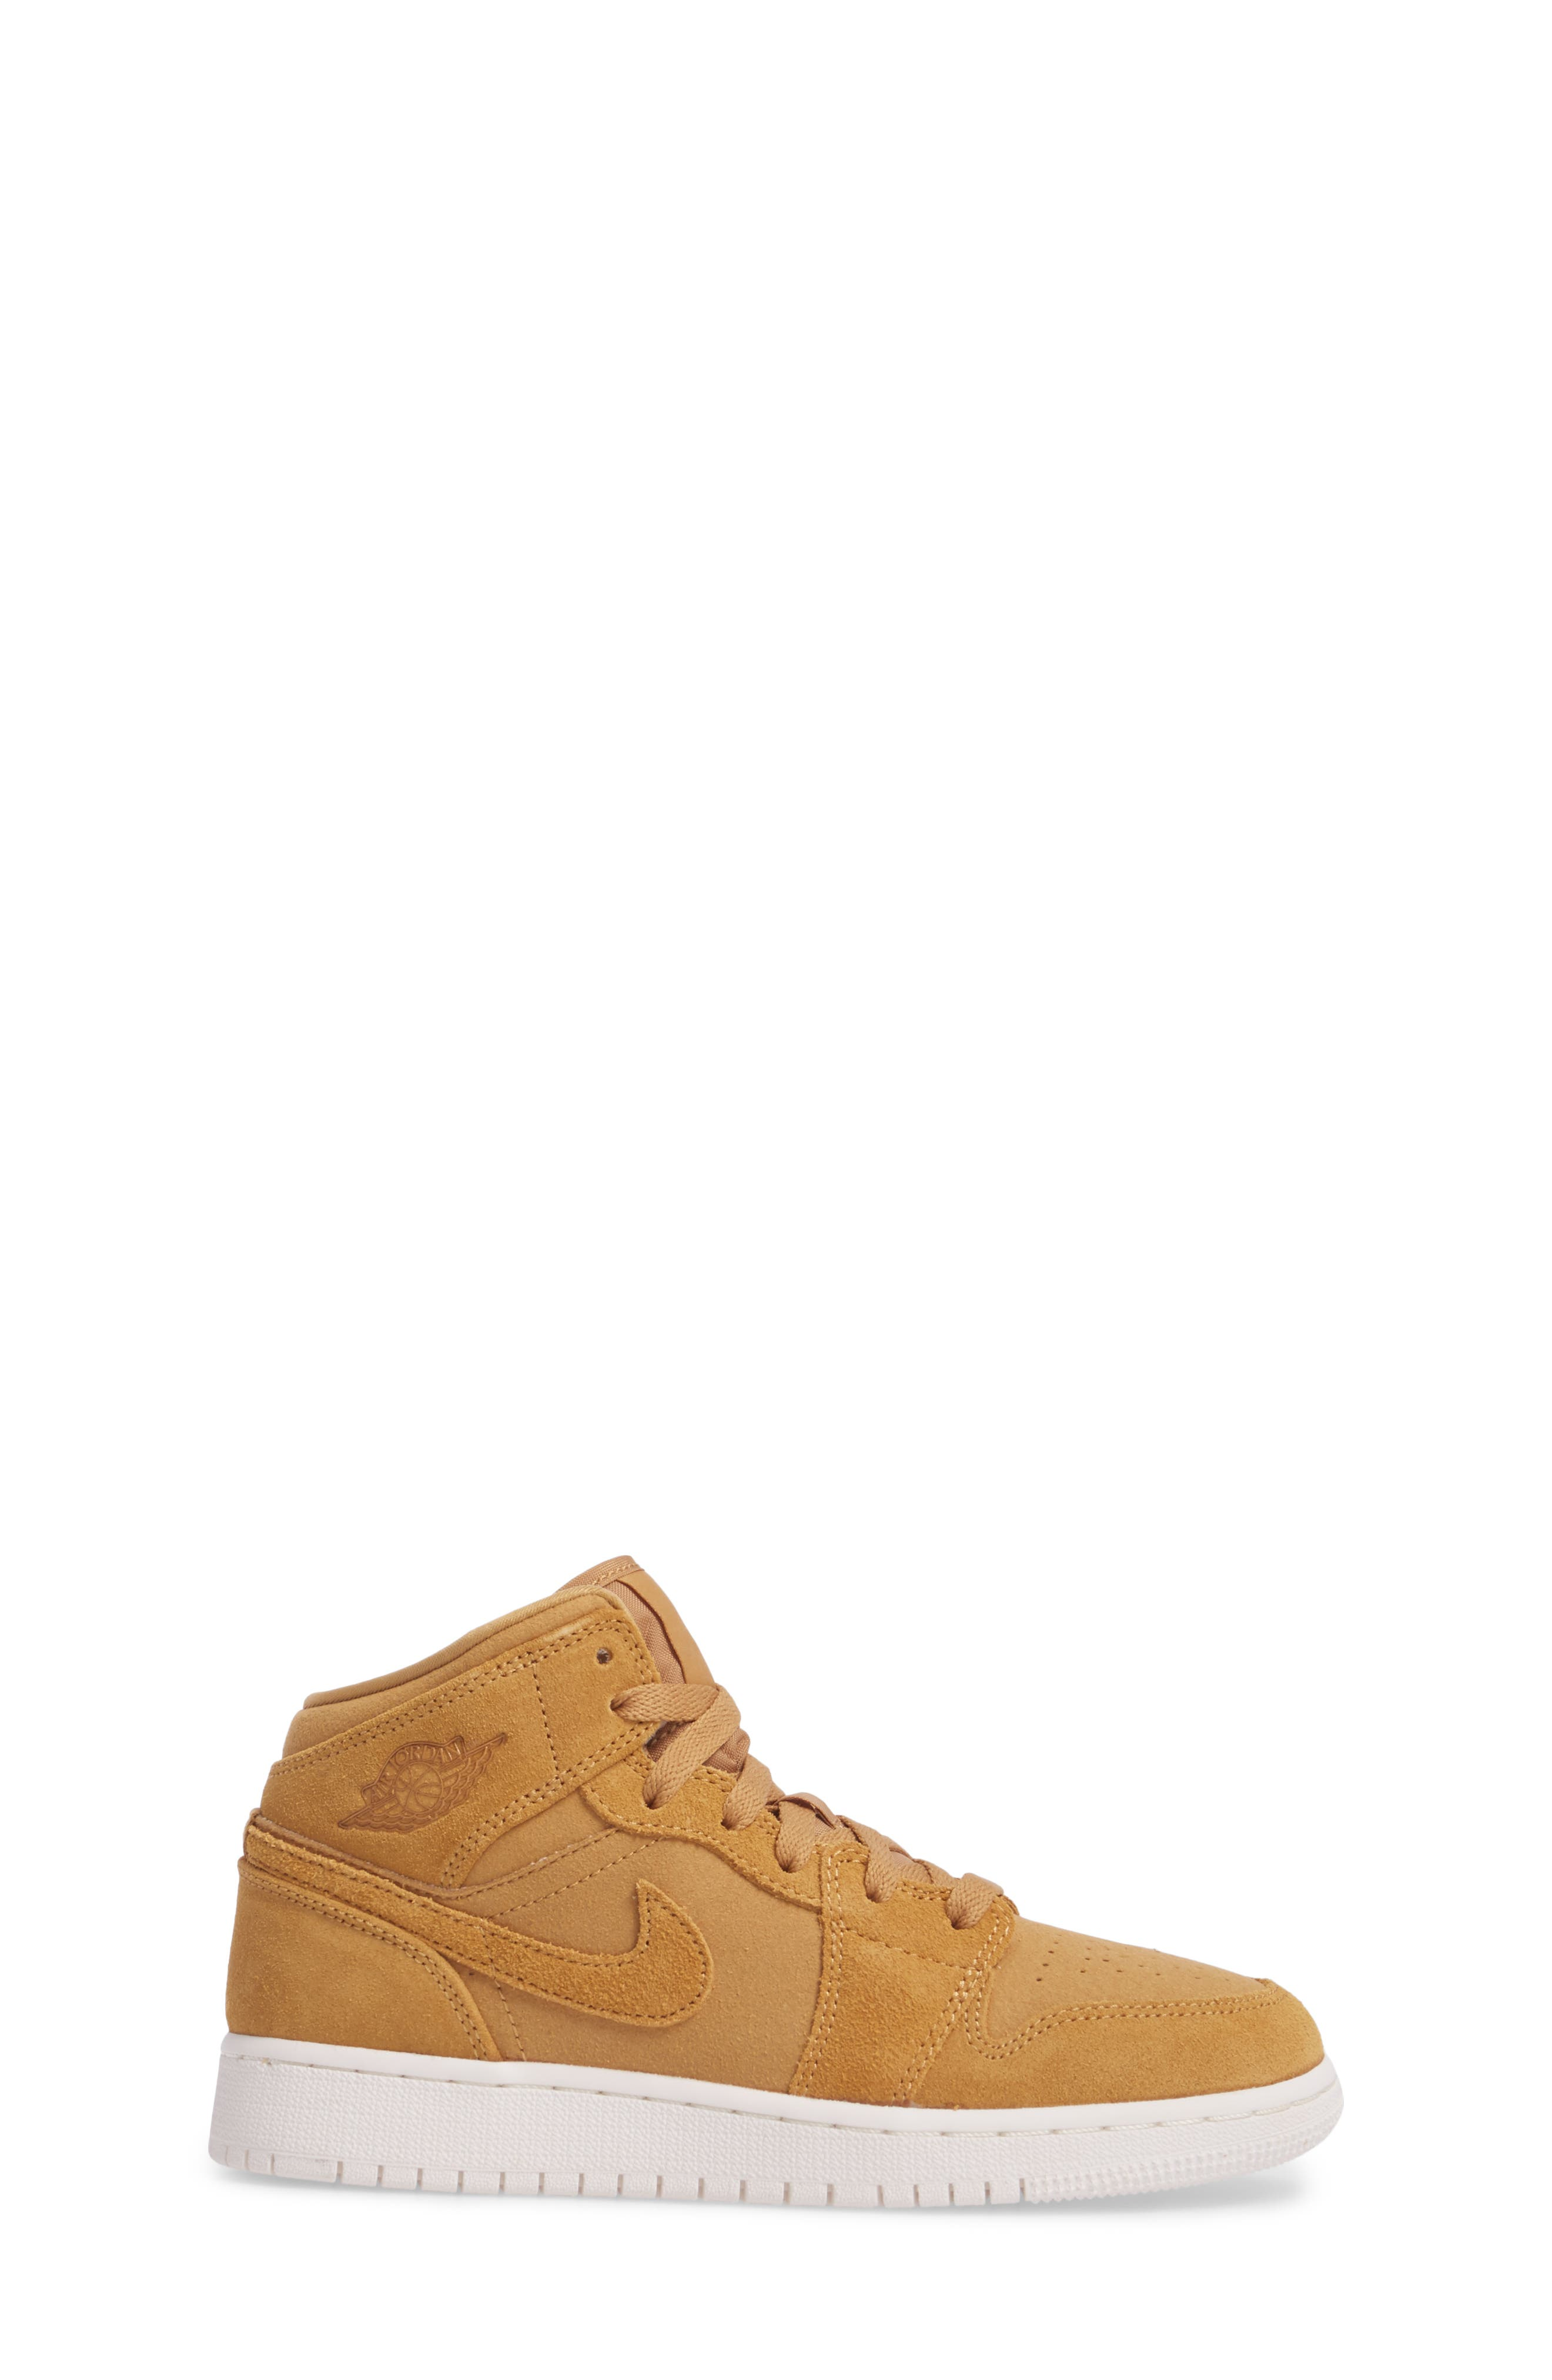 Alternate Image 3  - Nike 'Air Jordan 1 Mid' Sneaker (Big Kid)